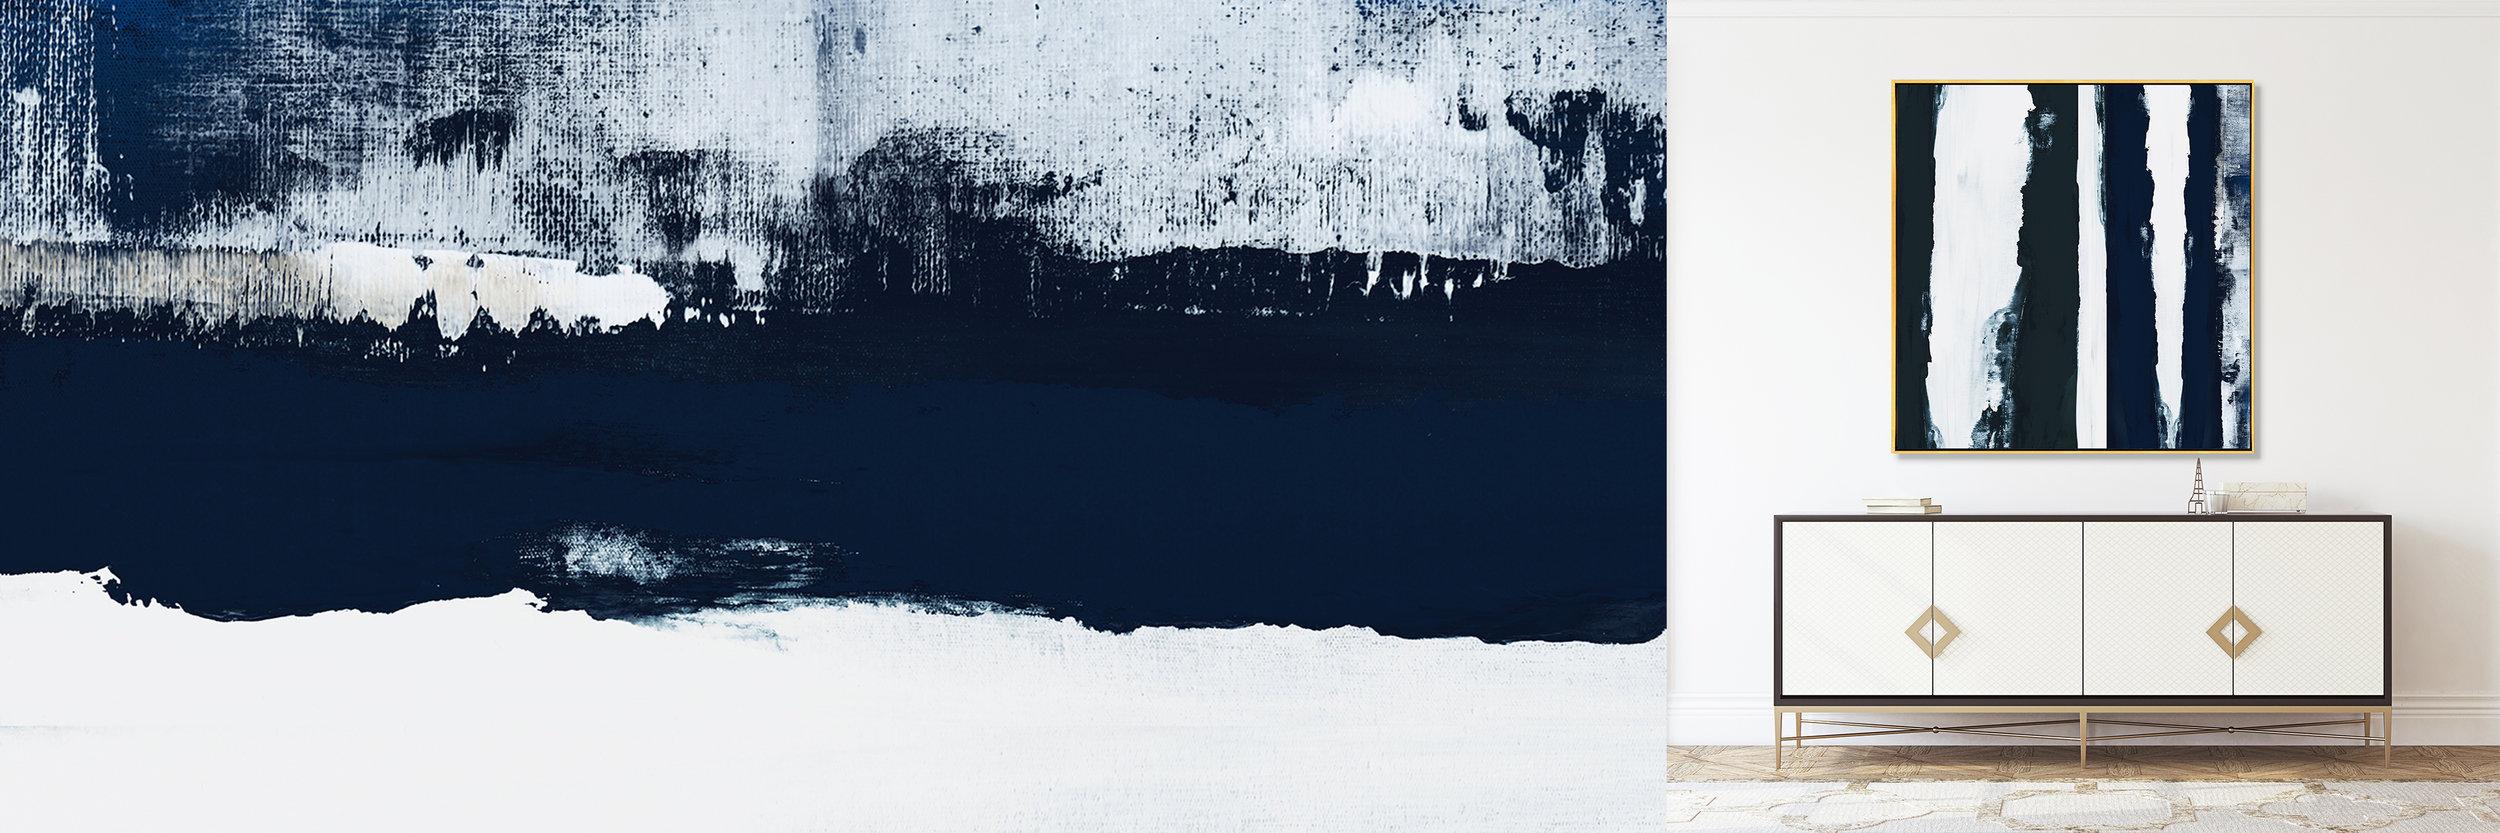 P1-Blues.jpg